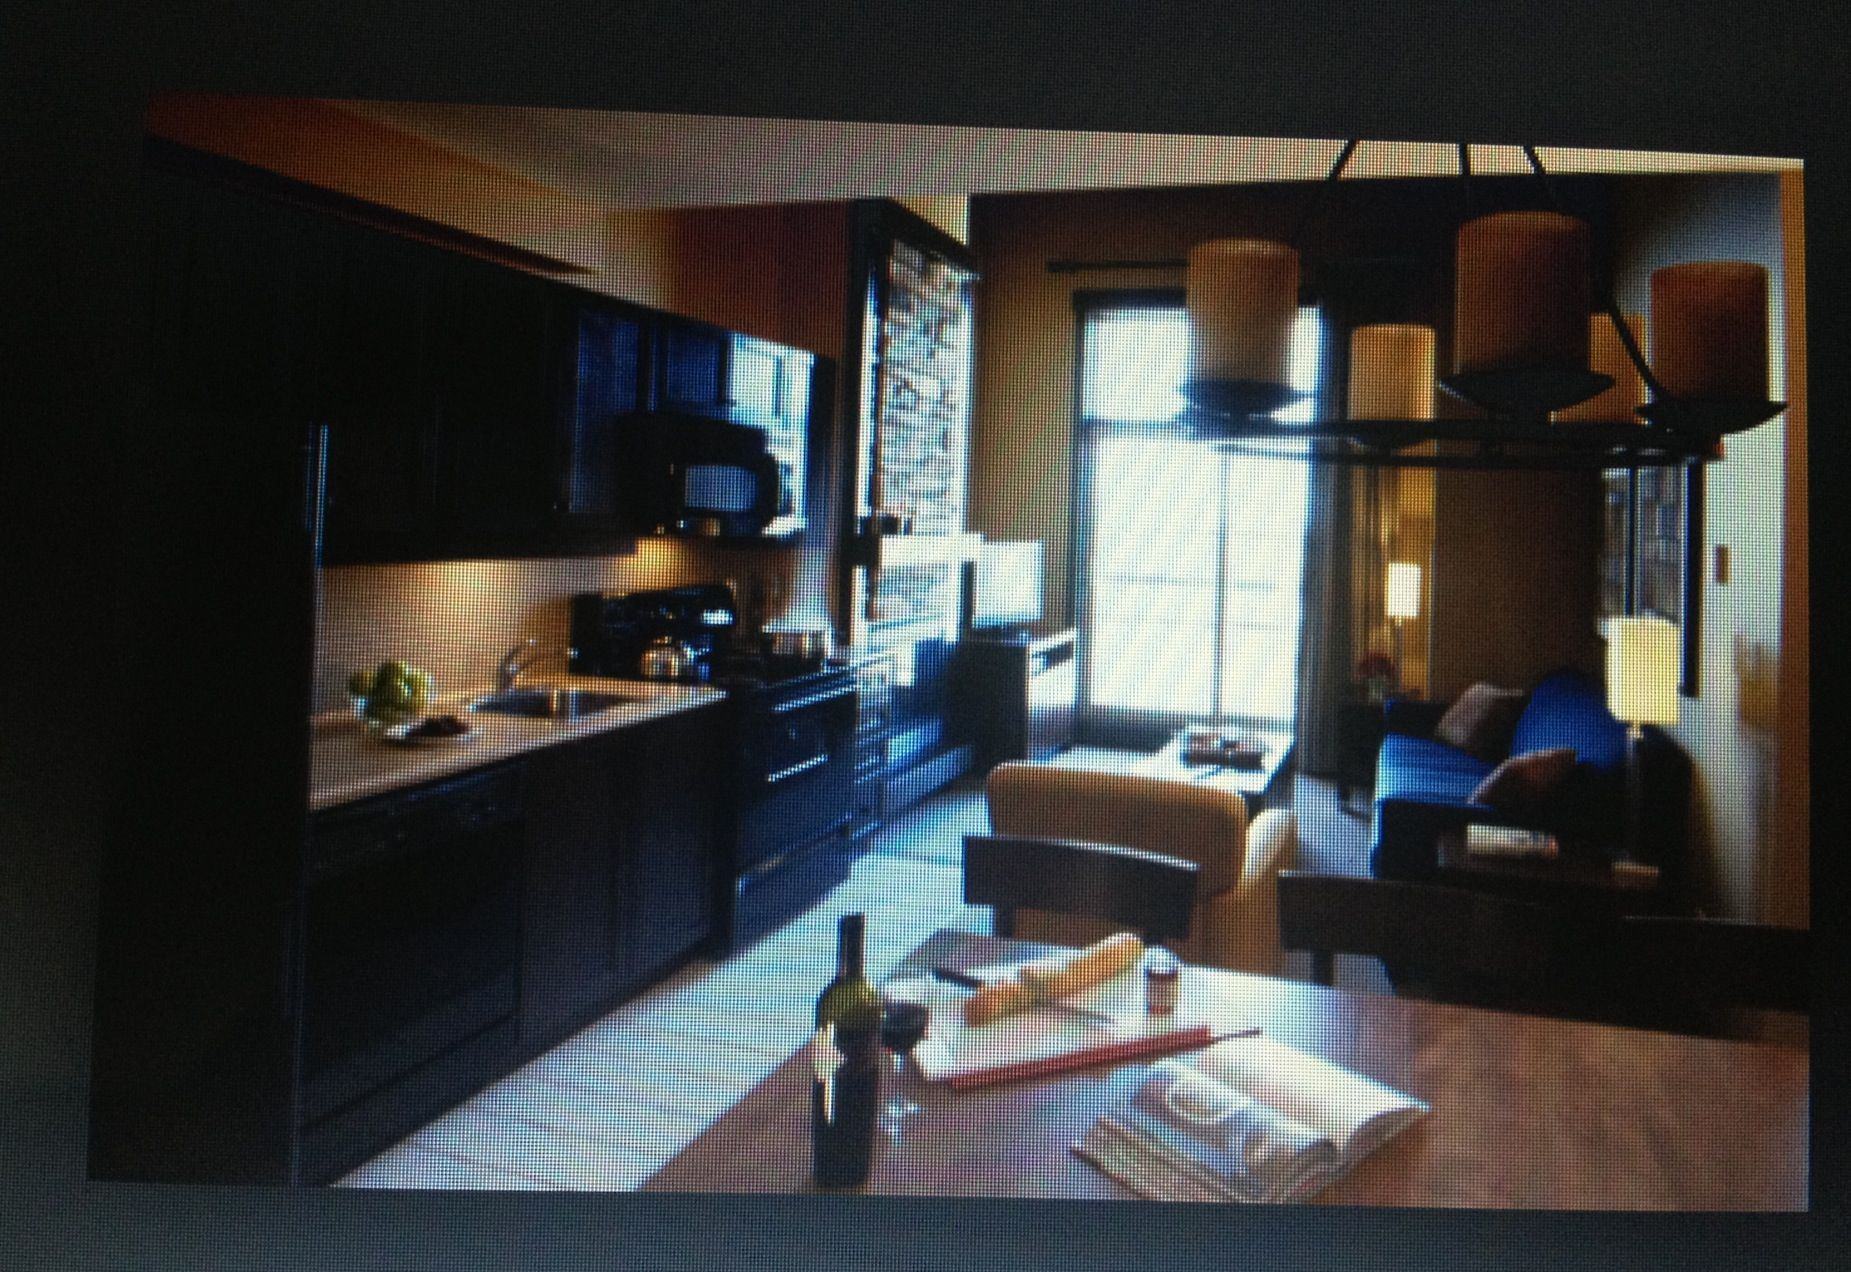 Küche! Farben. Ambiente. | Inspiration uploads. Possibilities ...